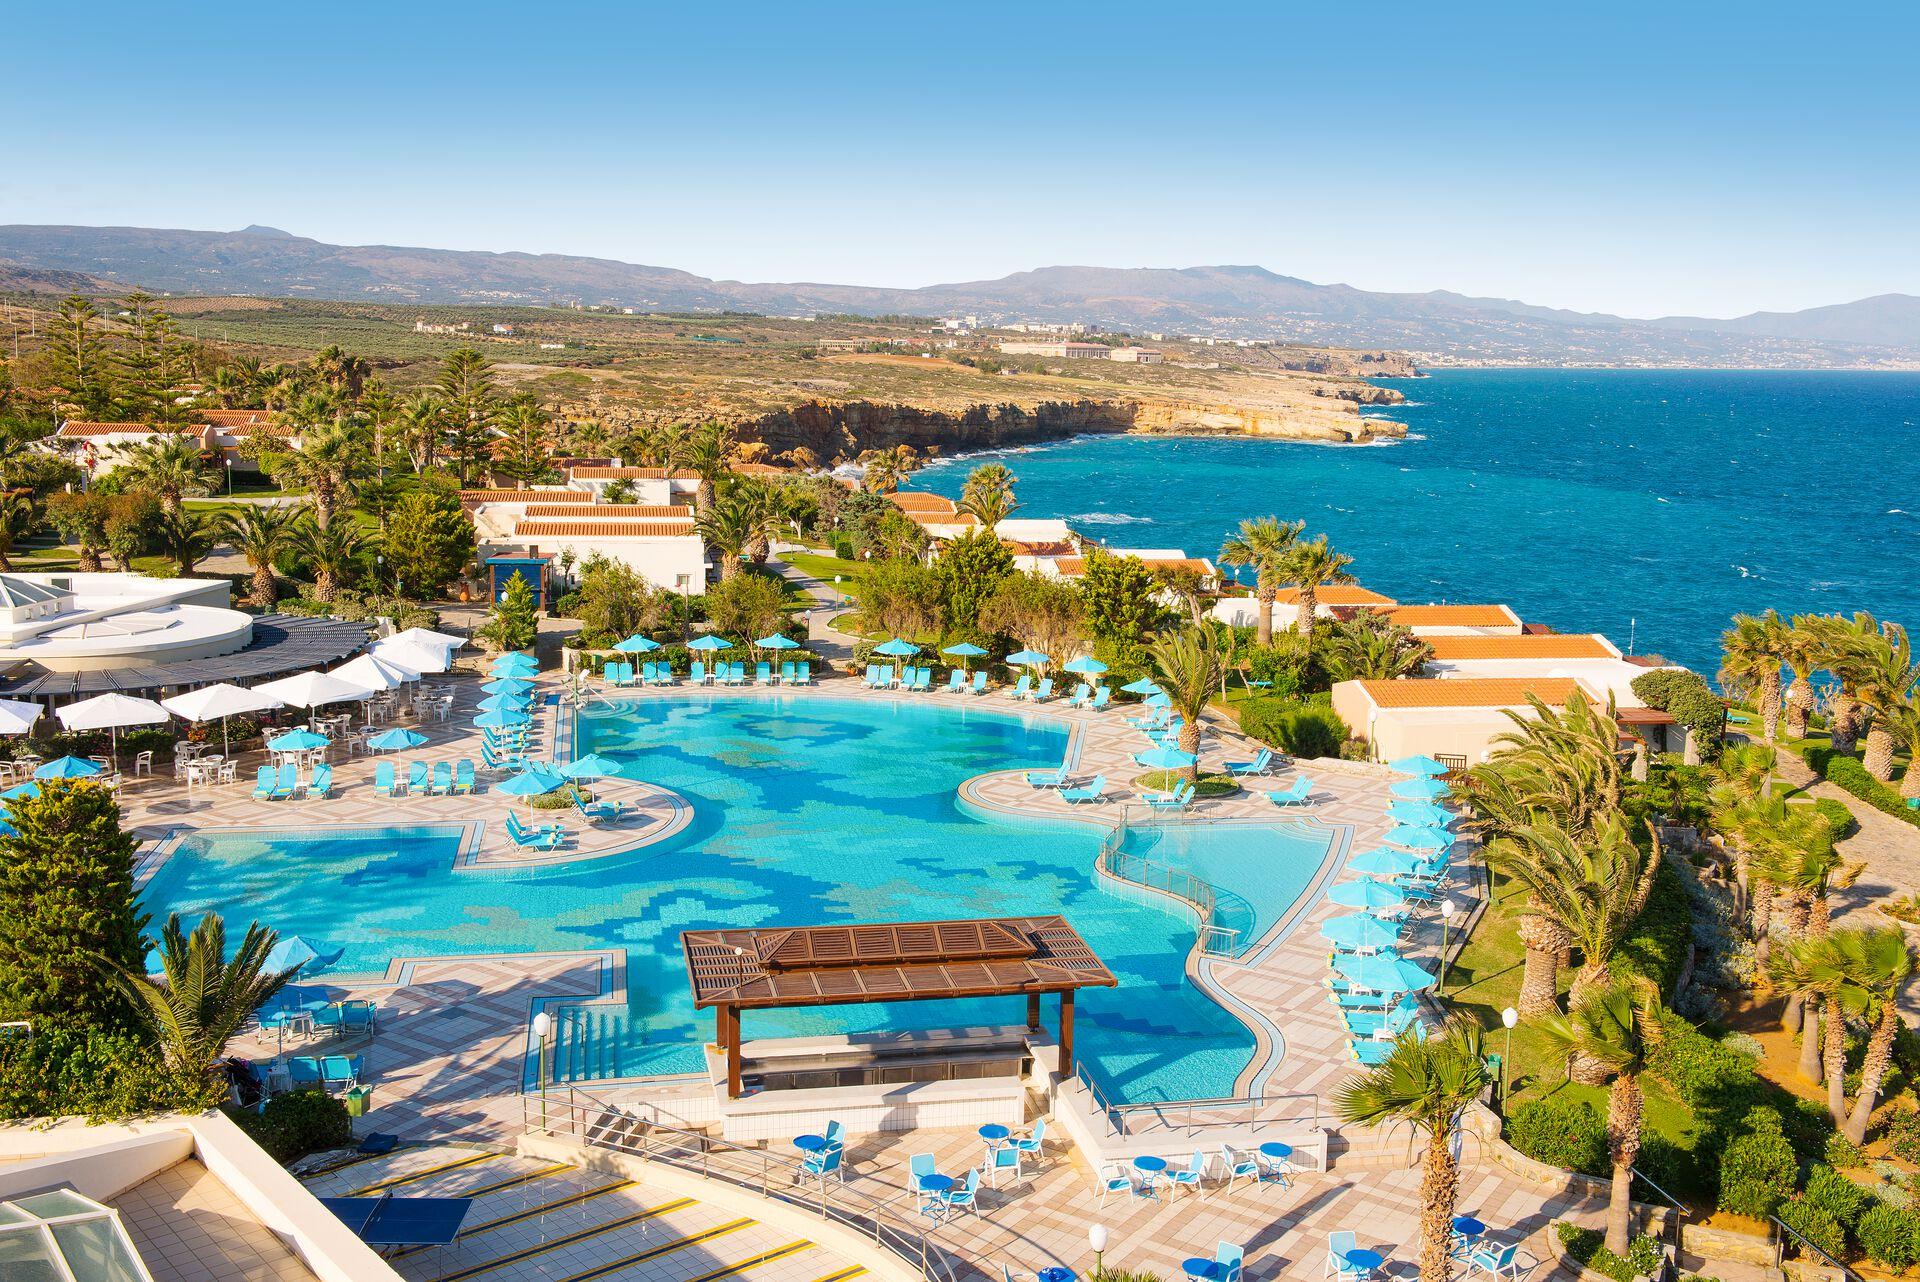 Hôtel Iberostar Creta Panorama & Creta Mare 4* - 1